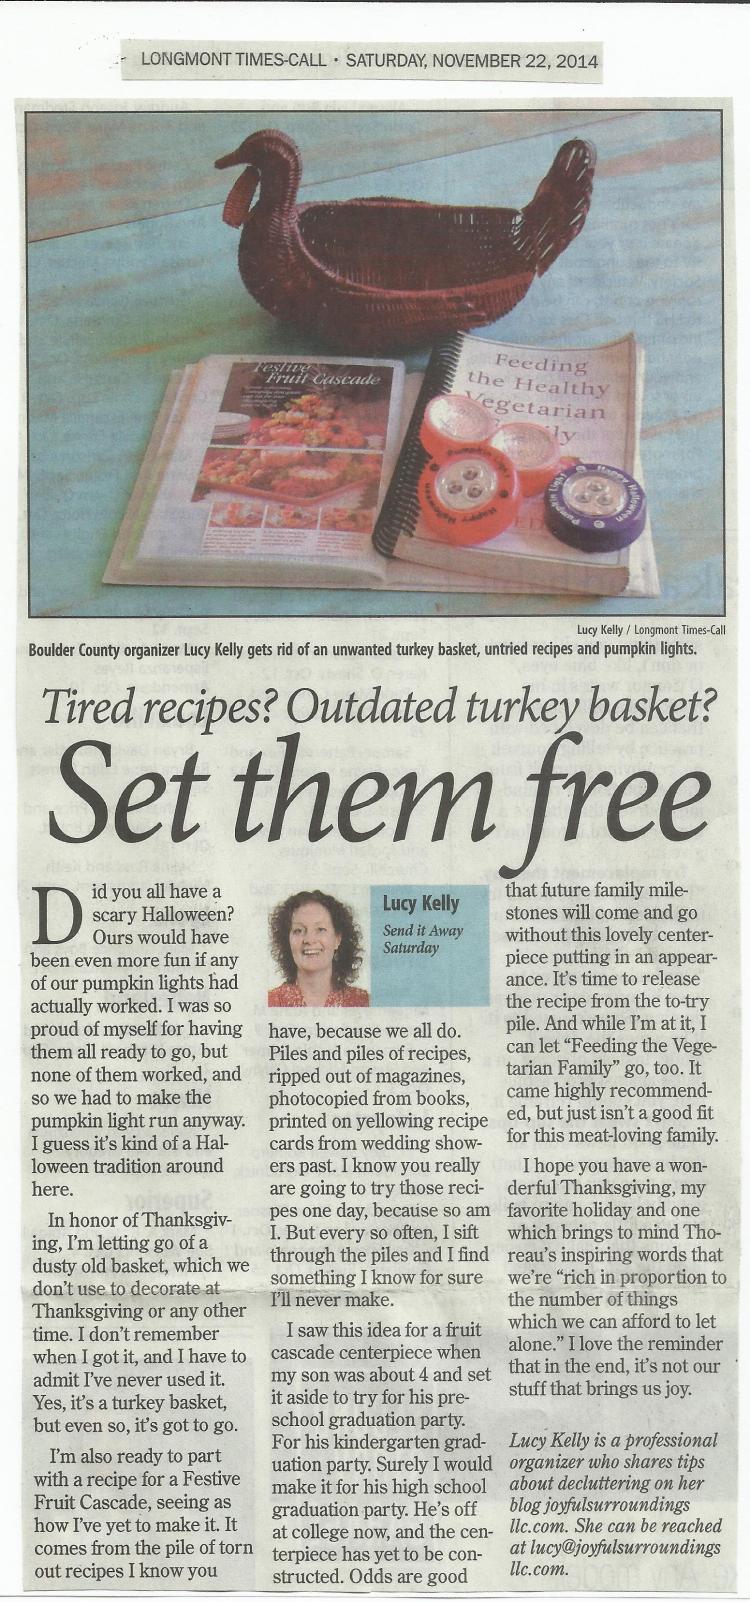 Longmont Times-Call Send it away Saturday column November 2014